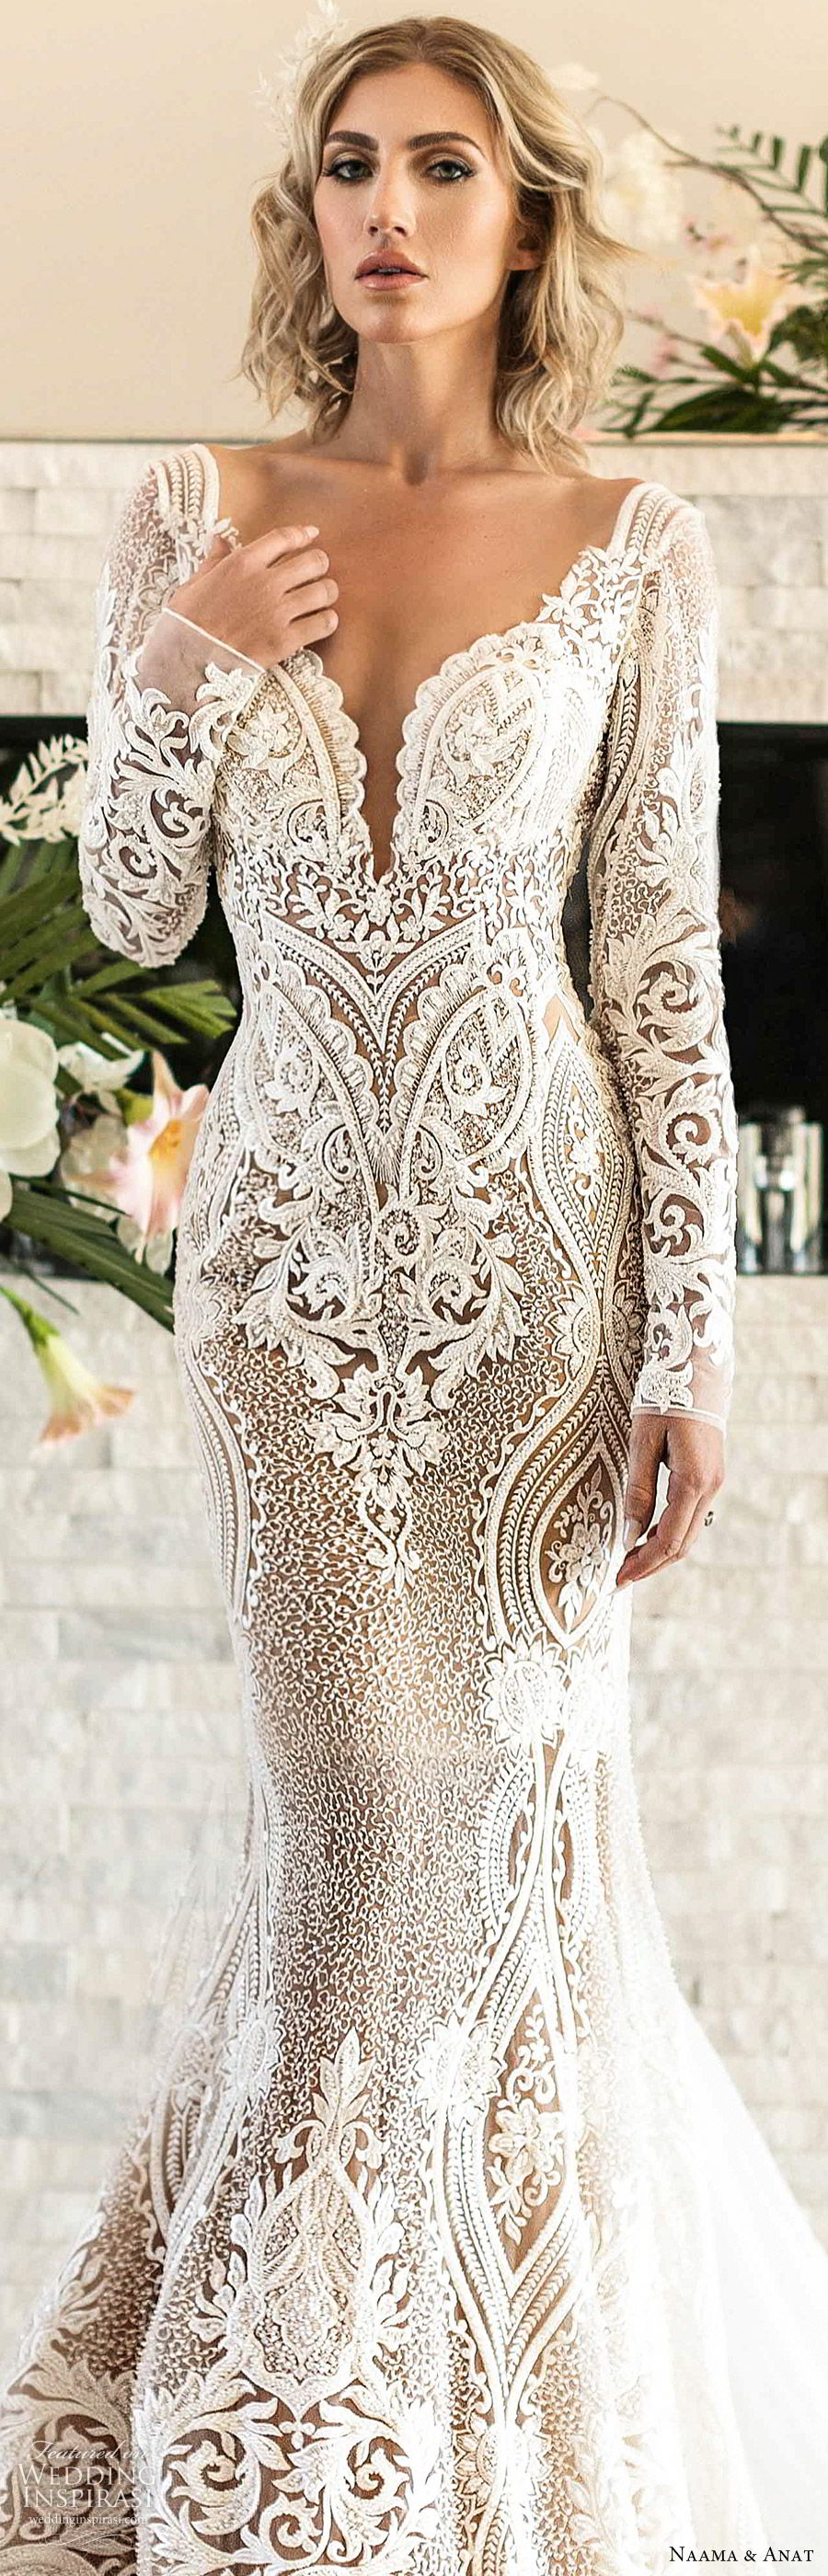 naama anat spring 2020 bridal long sleeves split sweetheart neckline lace sheath mermaid wedding dress (1) elegant modern low back chapel train lv